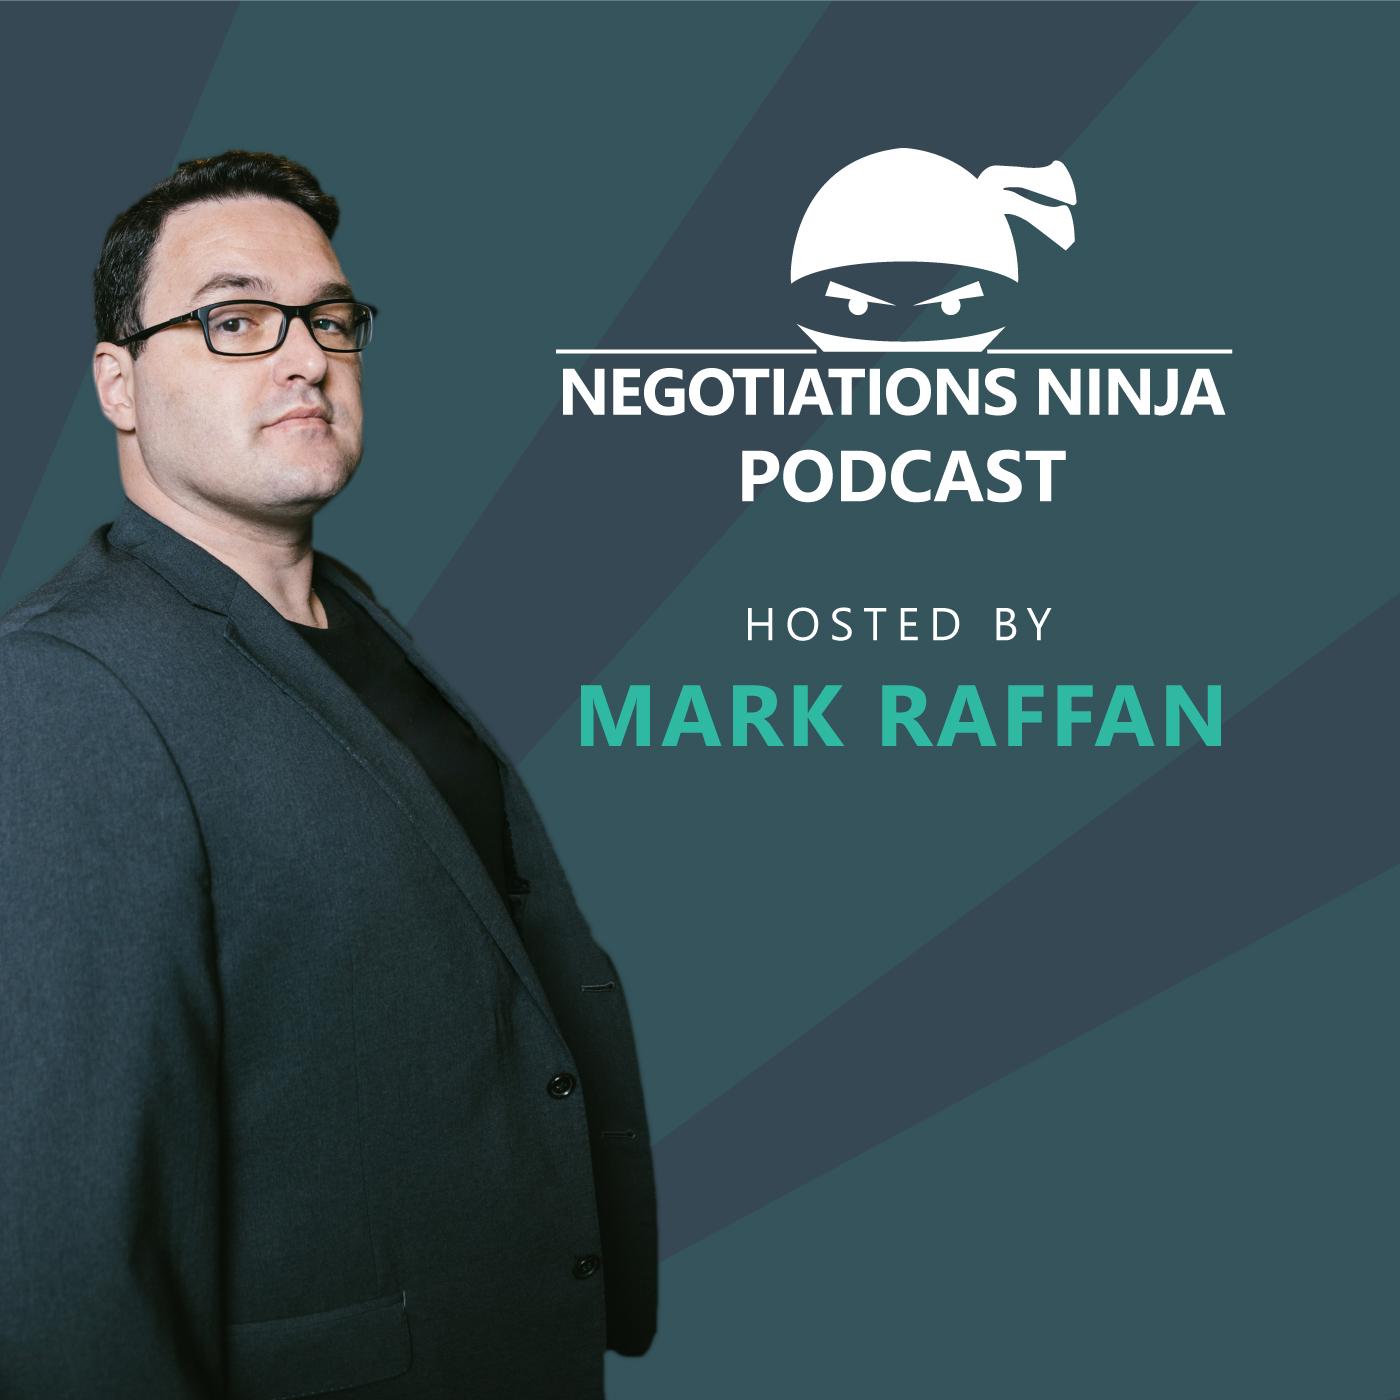 Keys To Developing Negotiation Skills That Work